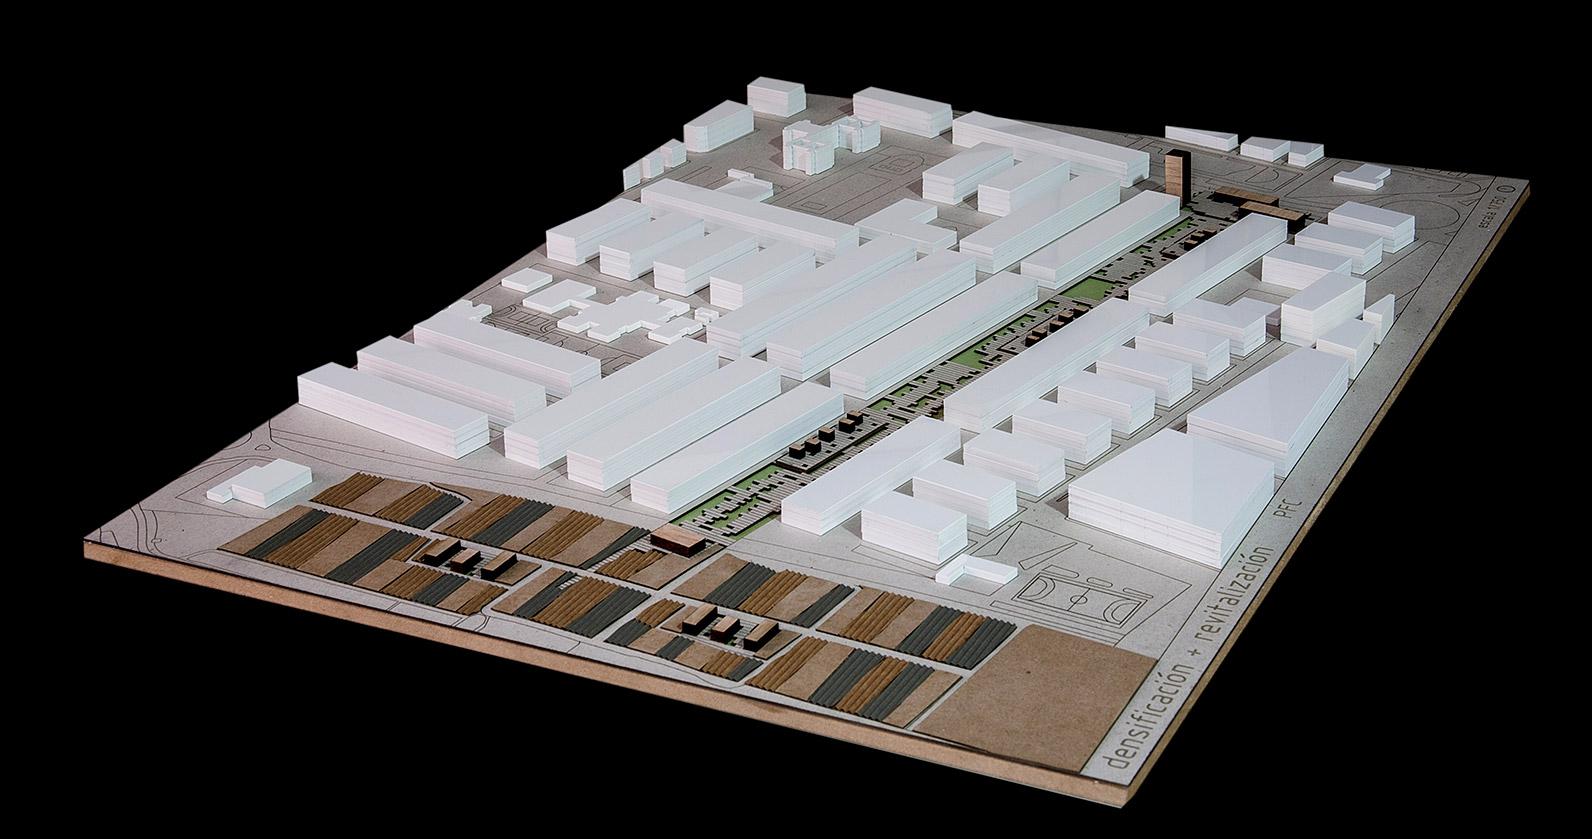 maqueta-arquitectura-valencia-pfc-tfg-UPV-huerta-arquiayuda (2)